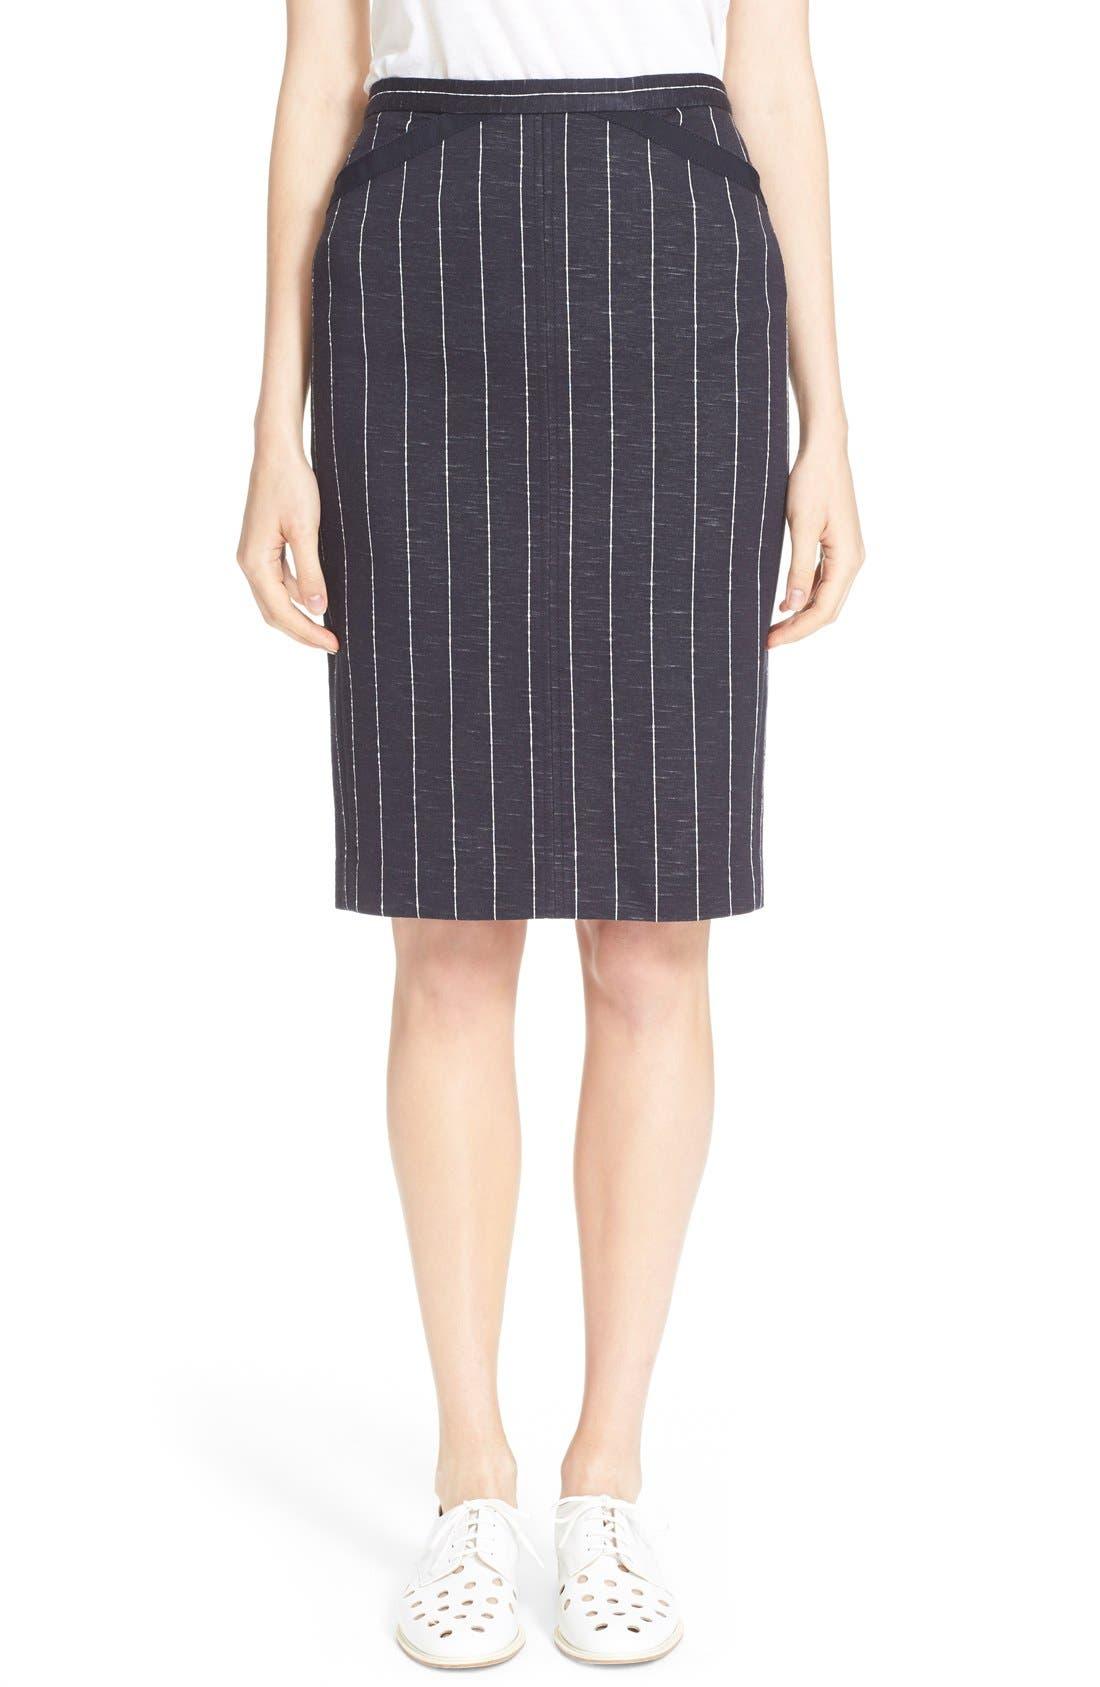 Alternate Image 1 Selected - ATM Anthony Thomas Melillo Stripe Pencil Skirt